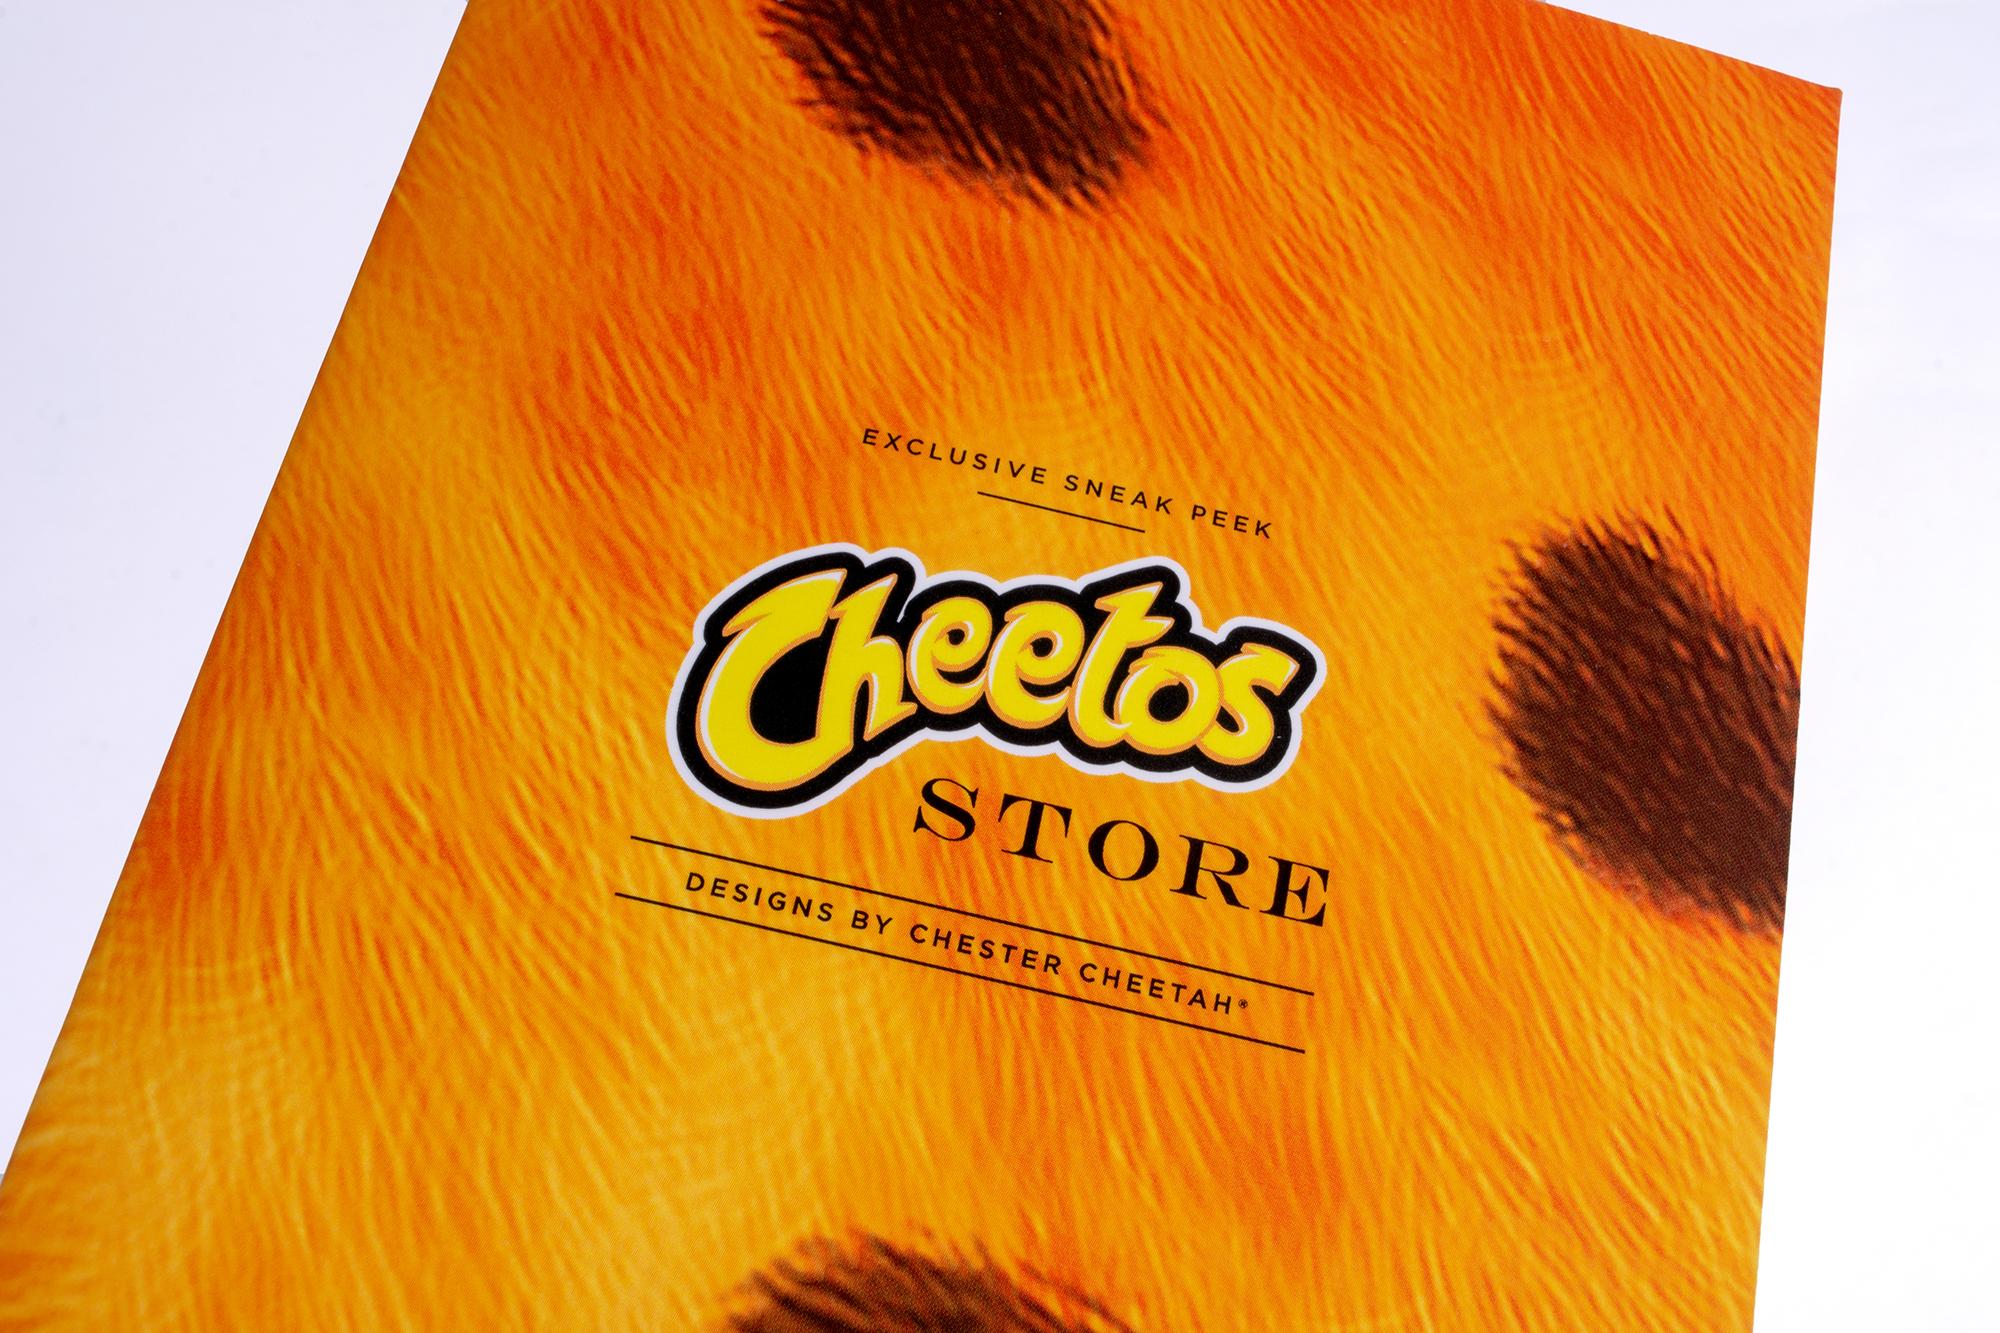 Cheetos_Store_2.jpg